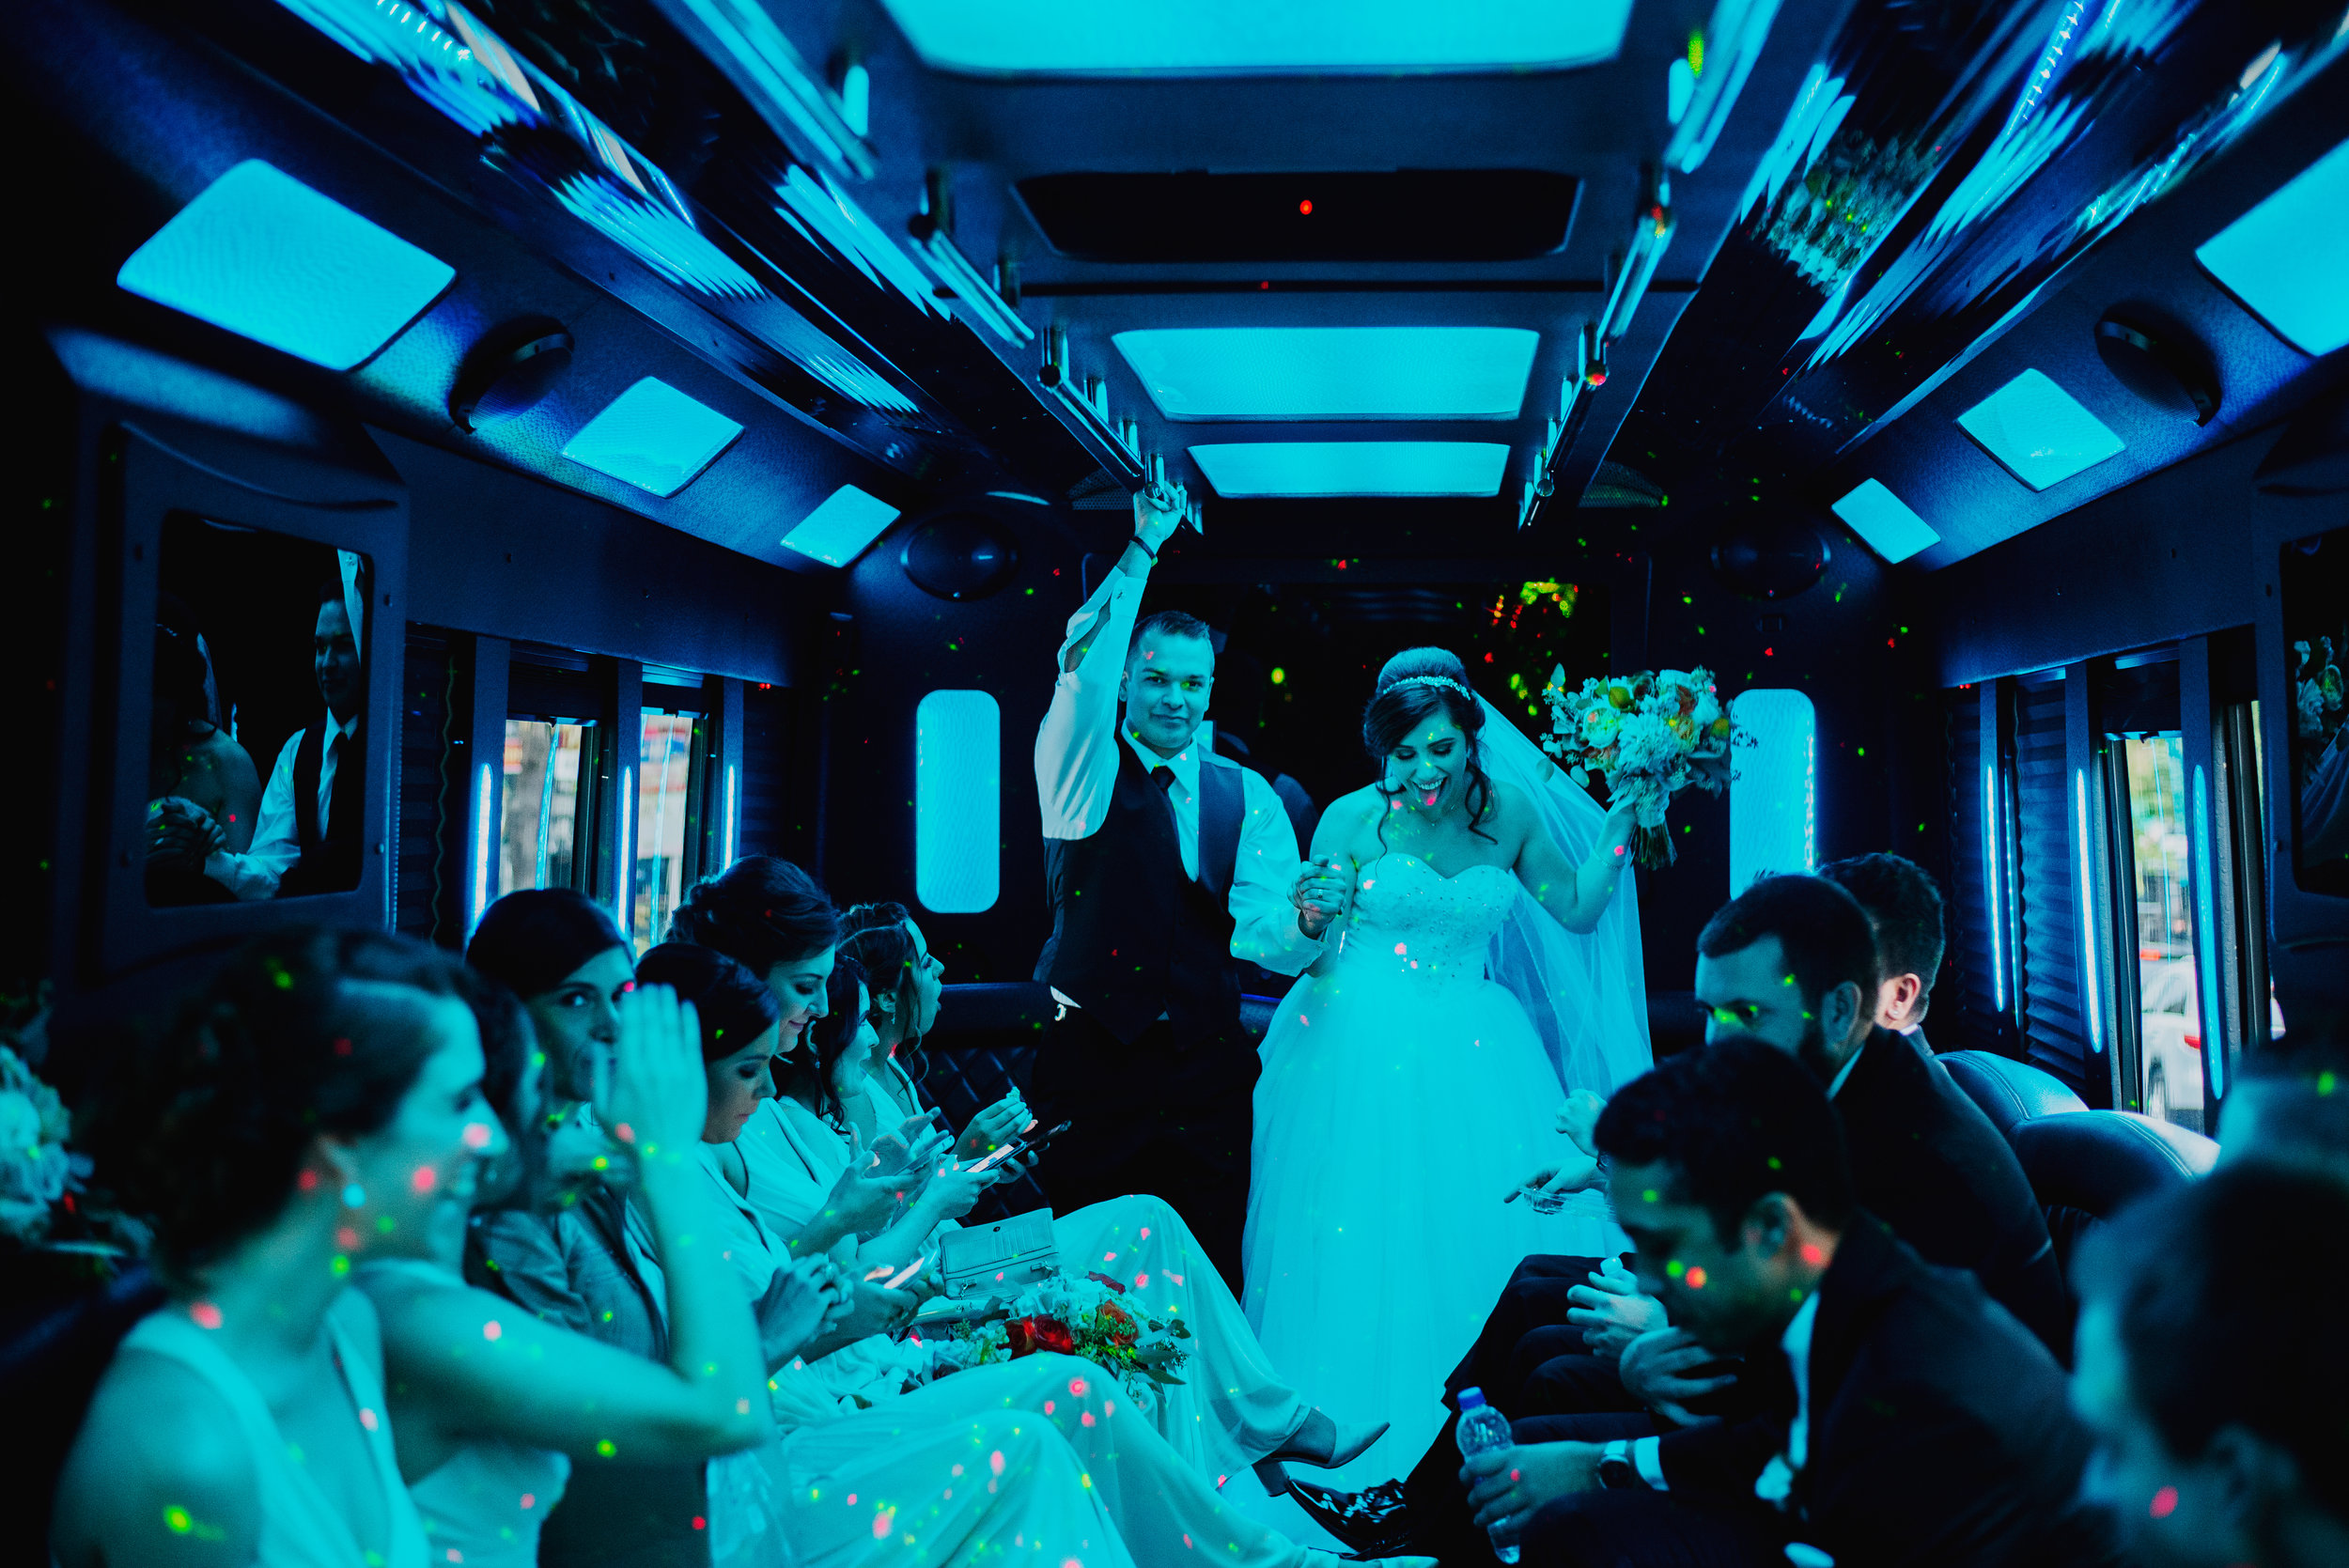 Barter-Party-Bus0009.jpg